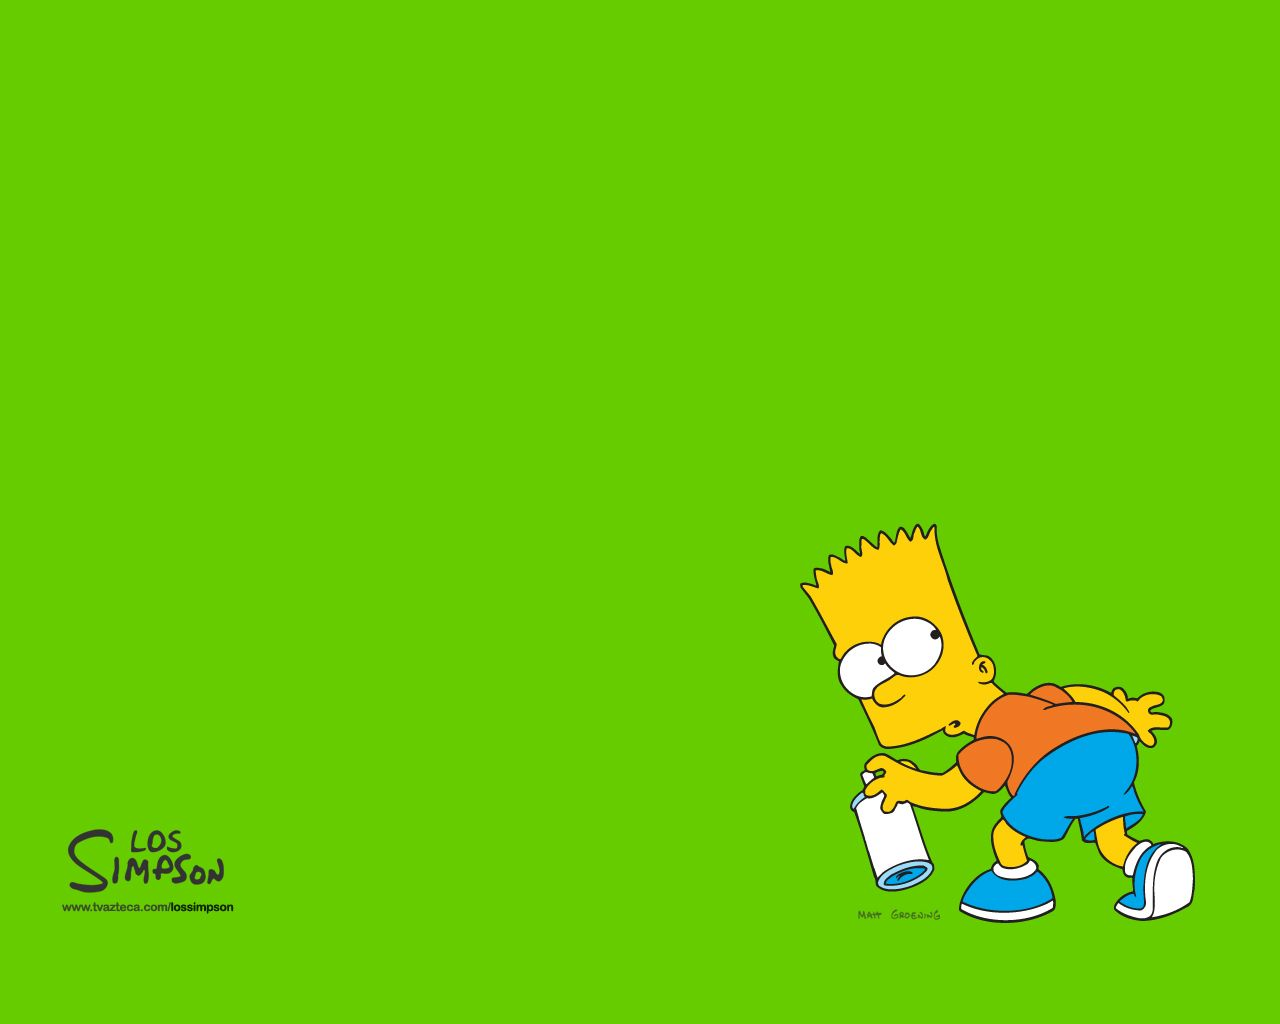 The Simpsons HD Wallpapers Breakfast food list, Bart